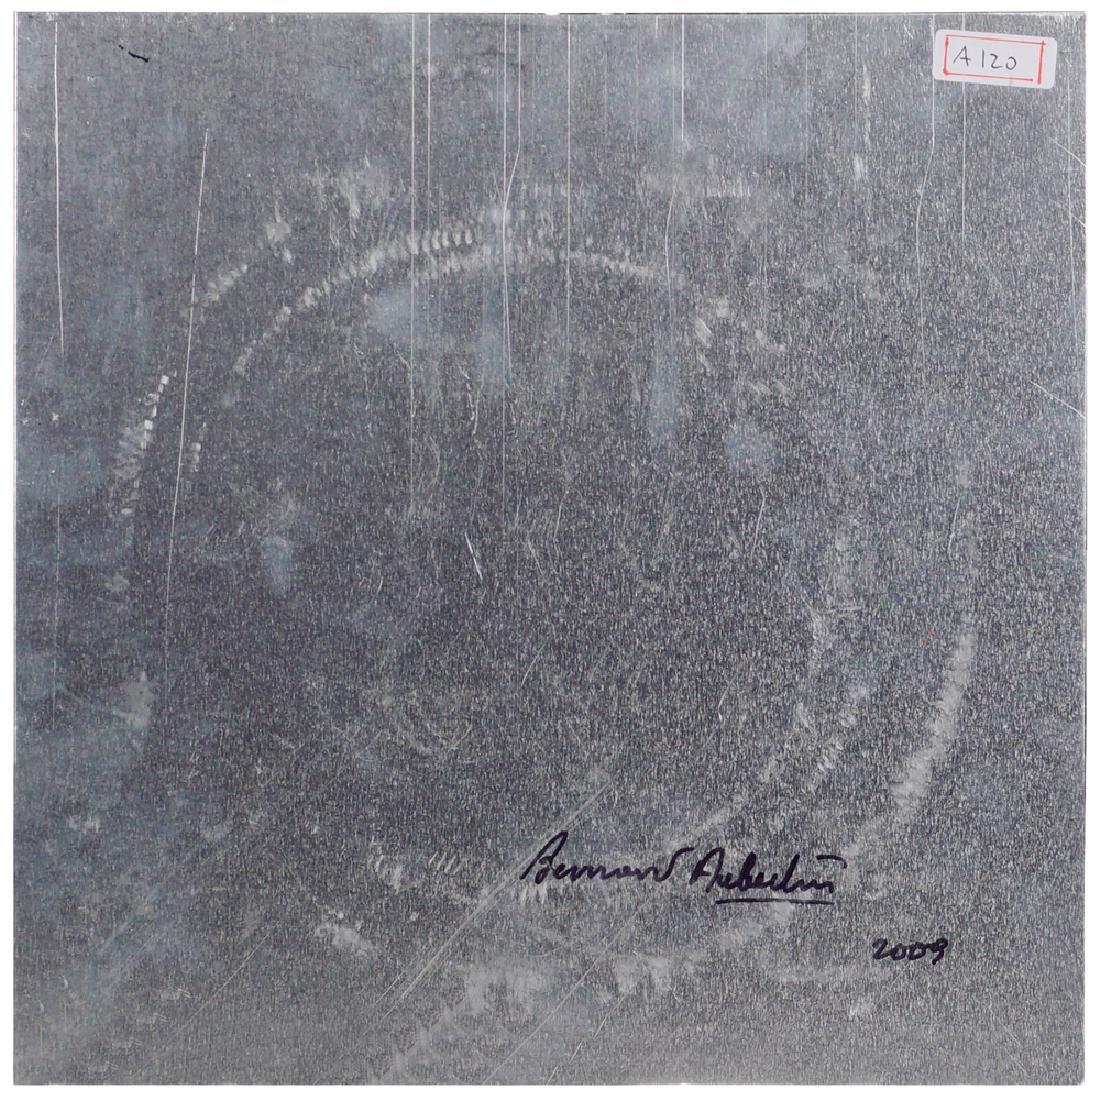 Bernard Aubertin Fontaney - Aux- Roses 1934 - 2015 - 2